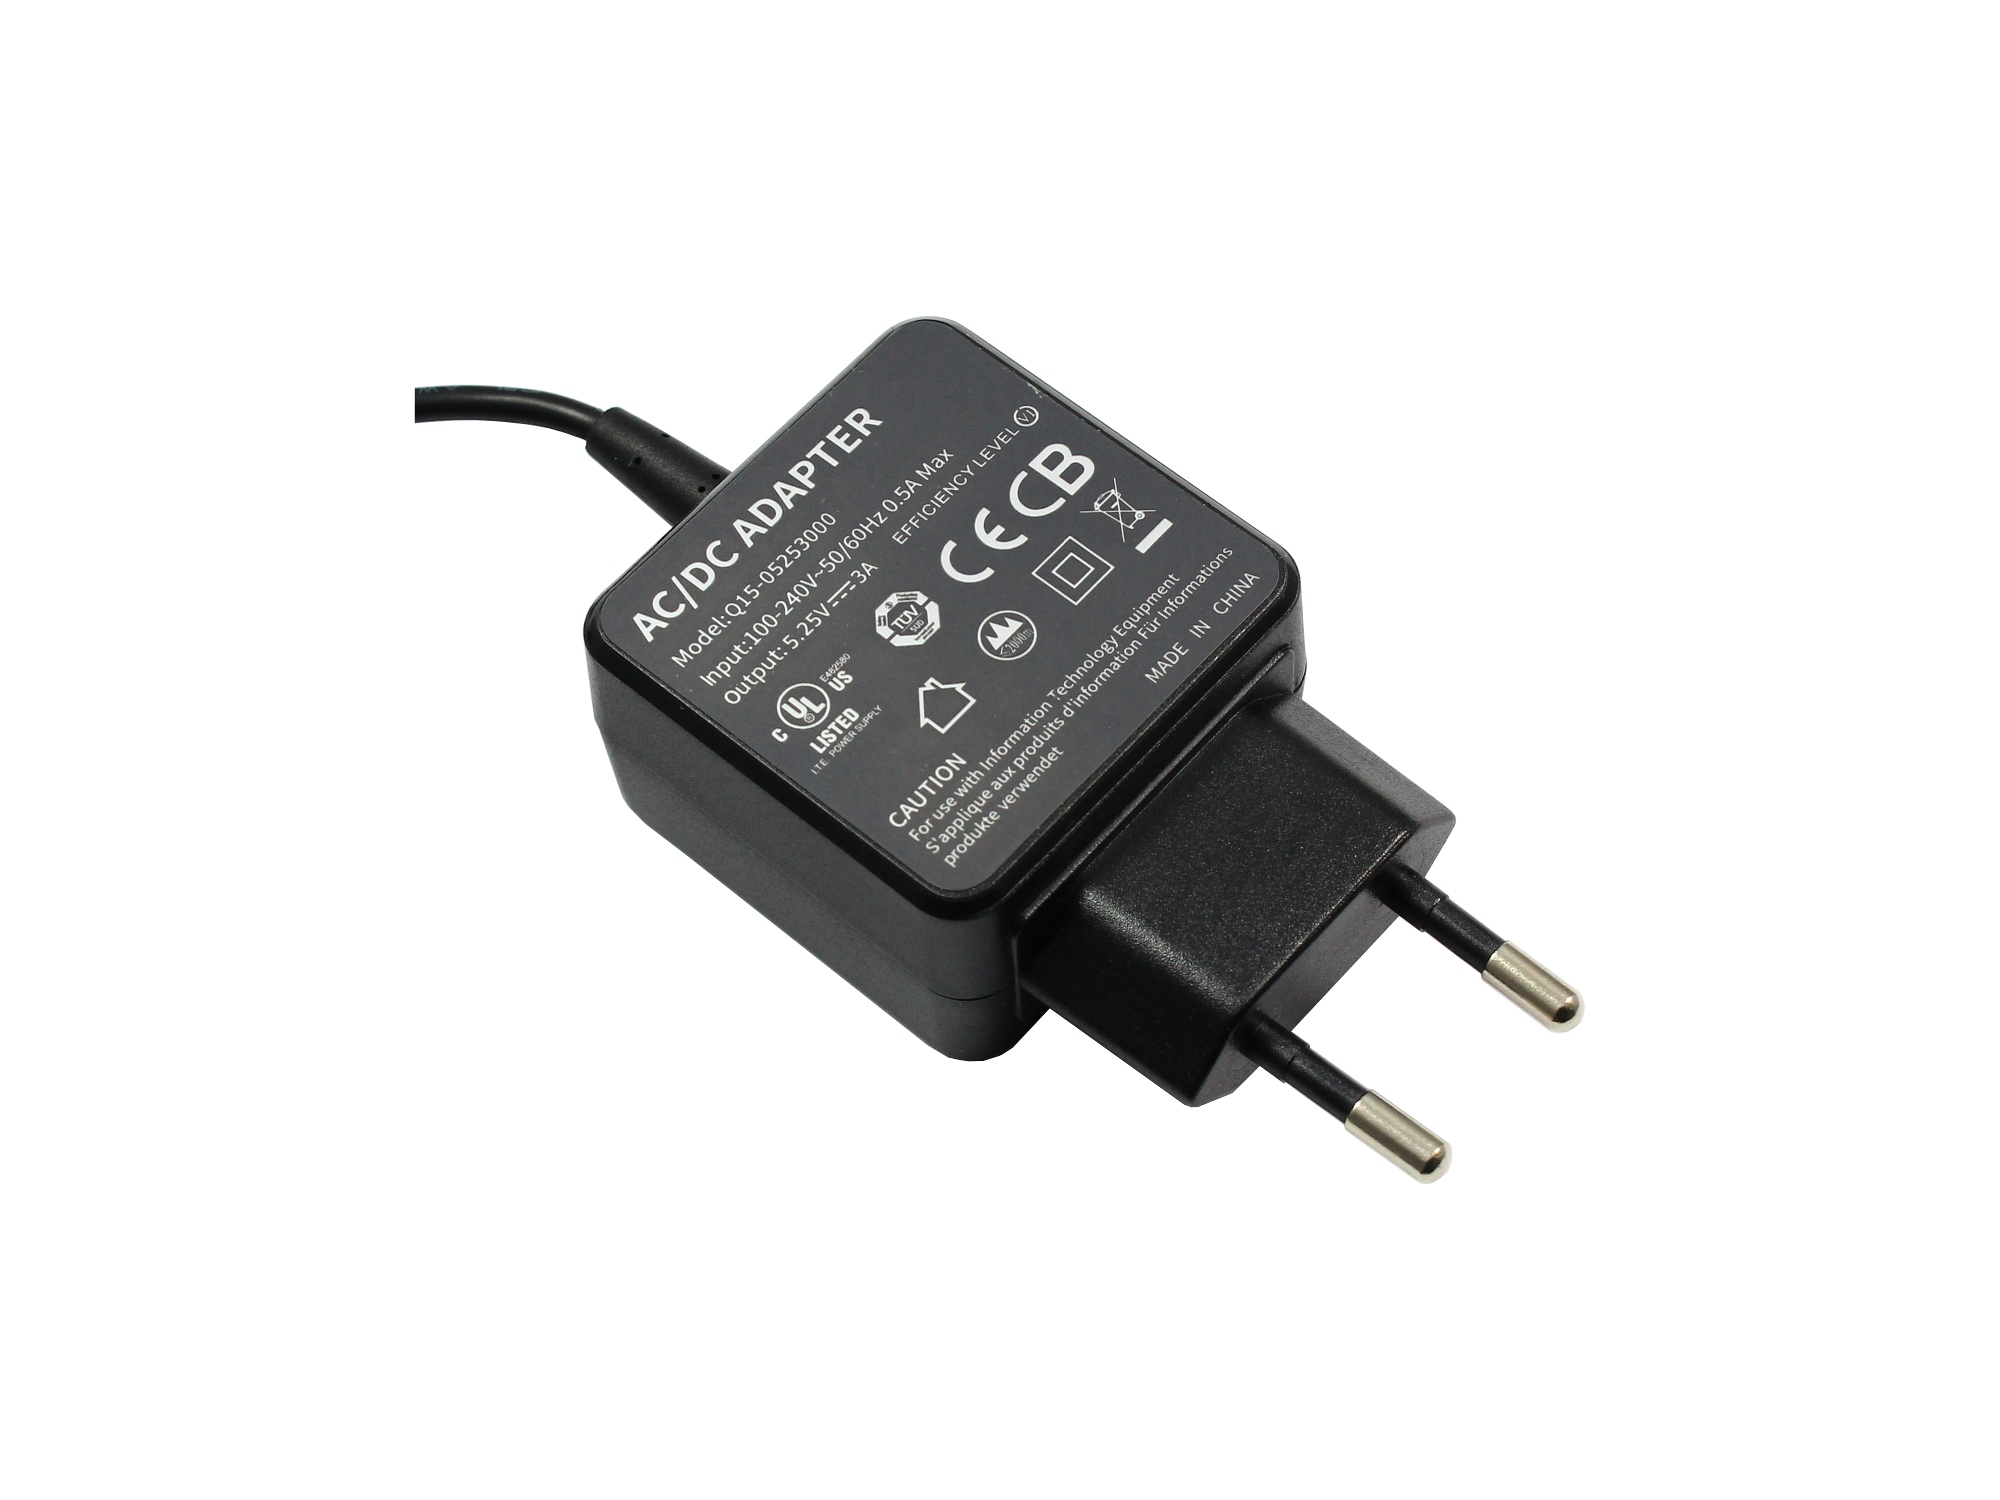 Incarcator 5.25V 3A 15W conector Micro-USB